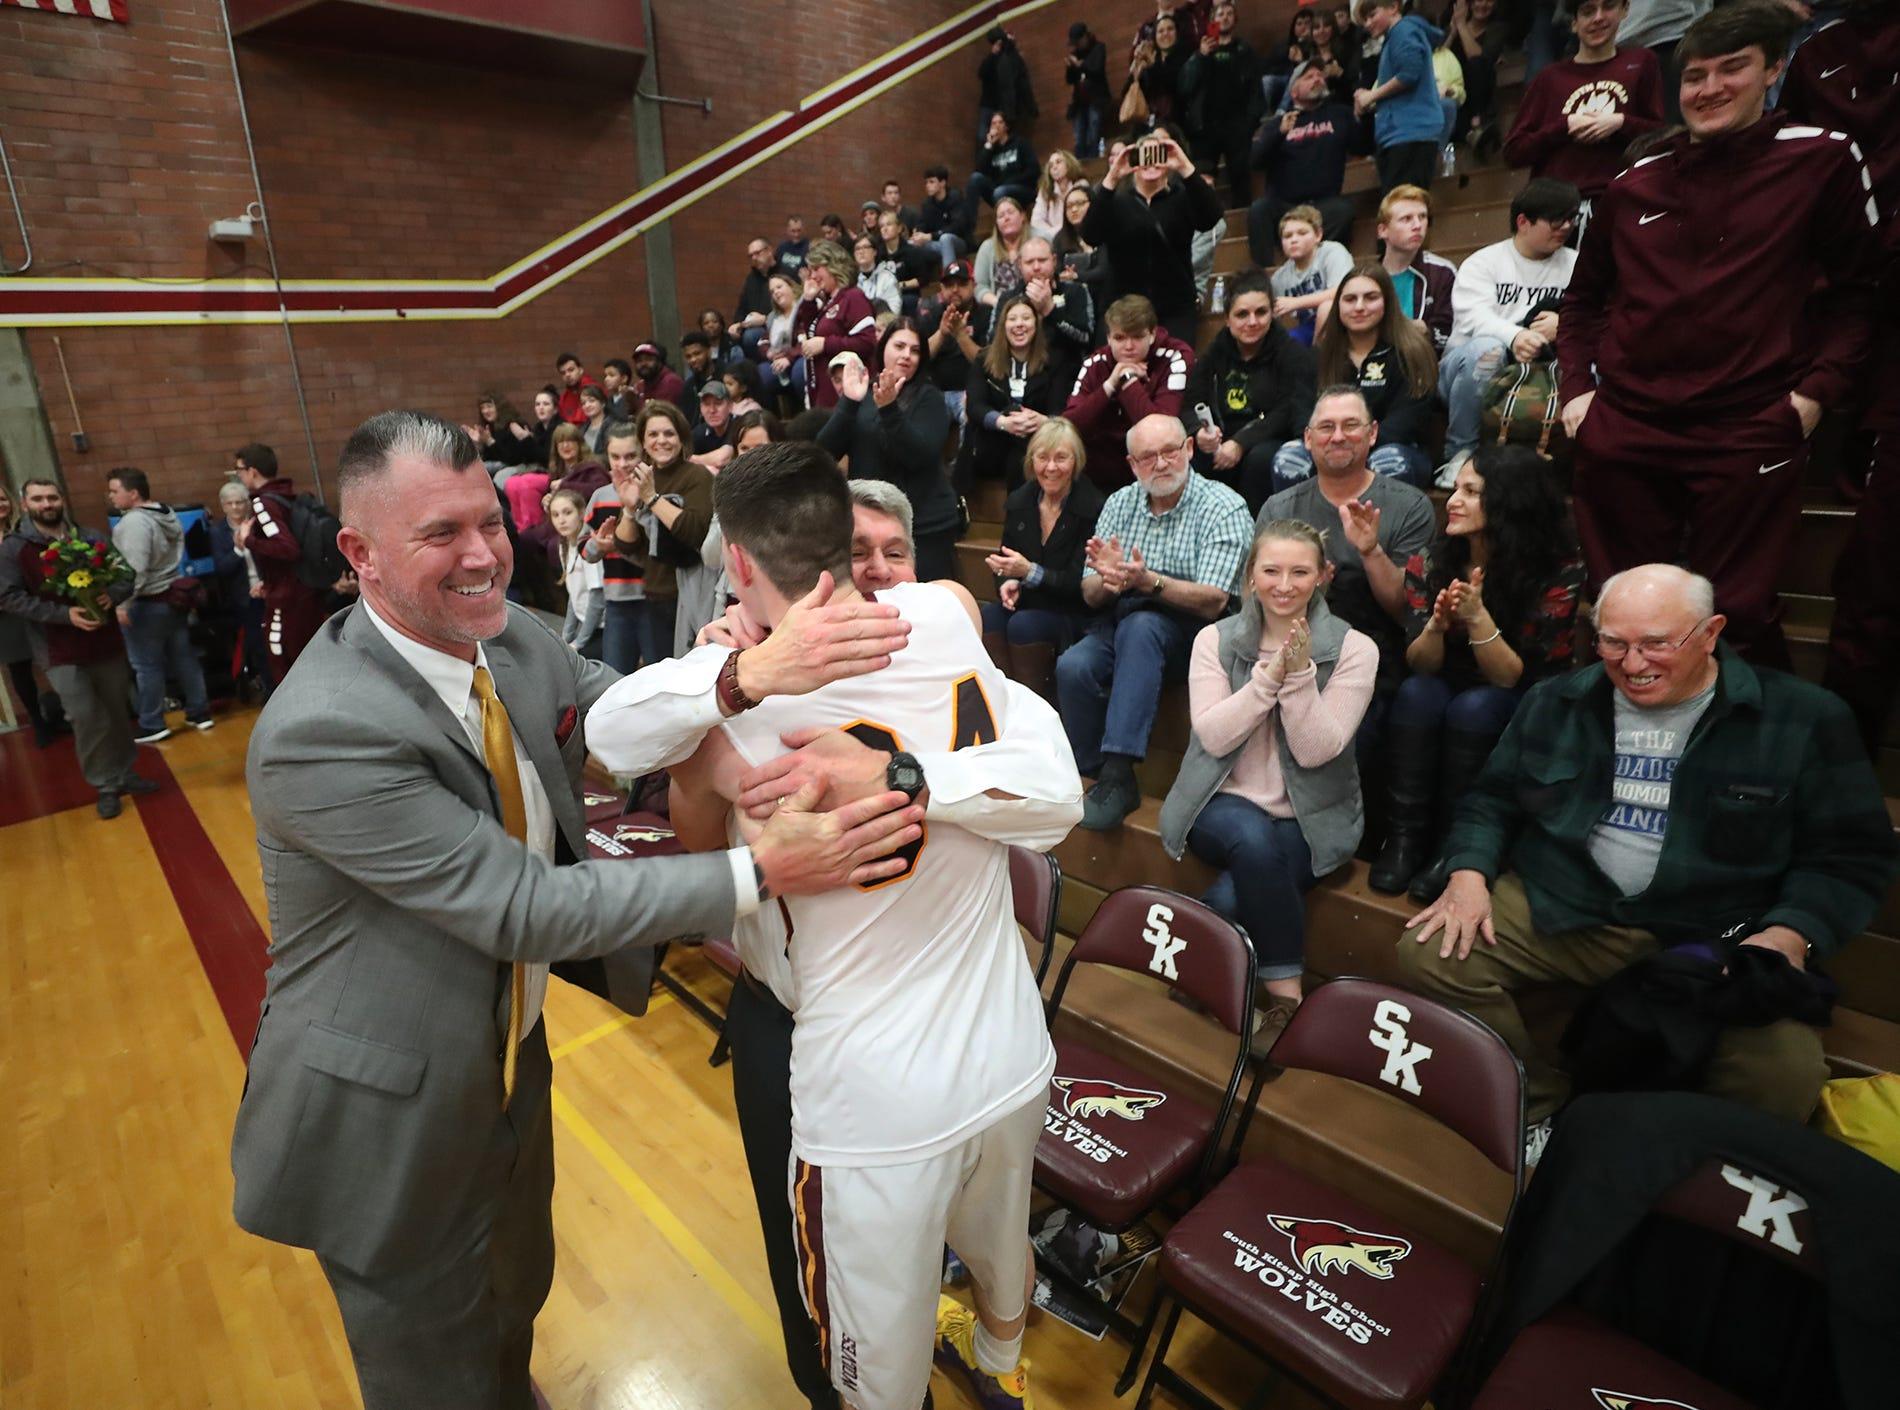 South Kitsap High School varsity head basketball coach John Callaghan won his 300th game against Bellarmine at South Kitsap on Thursday, January 17, 2019.  Coach Callaghan gets hugs after the game.